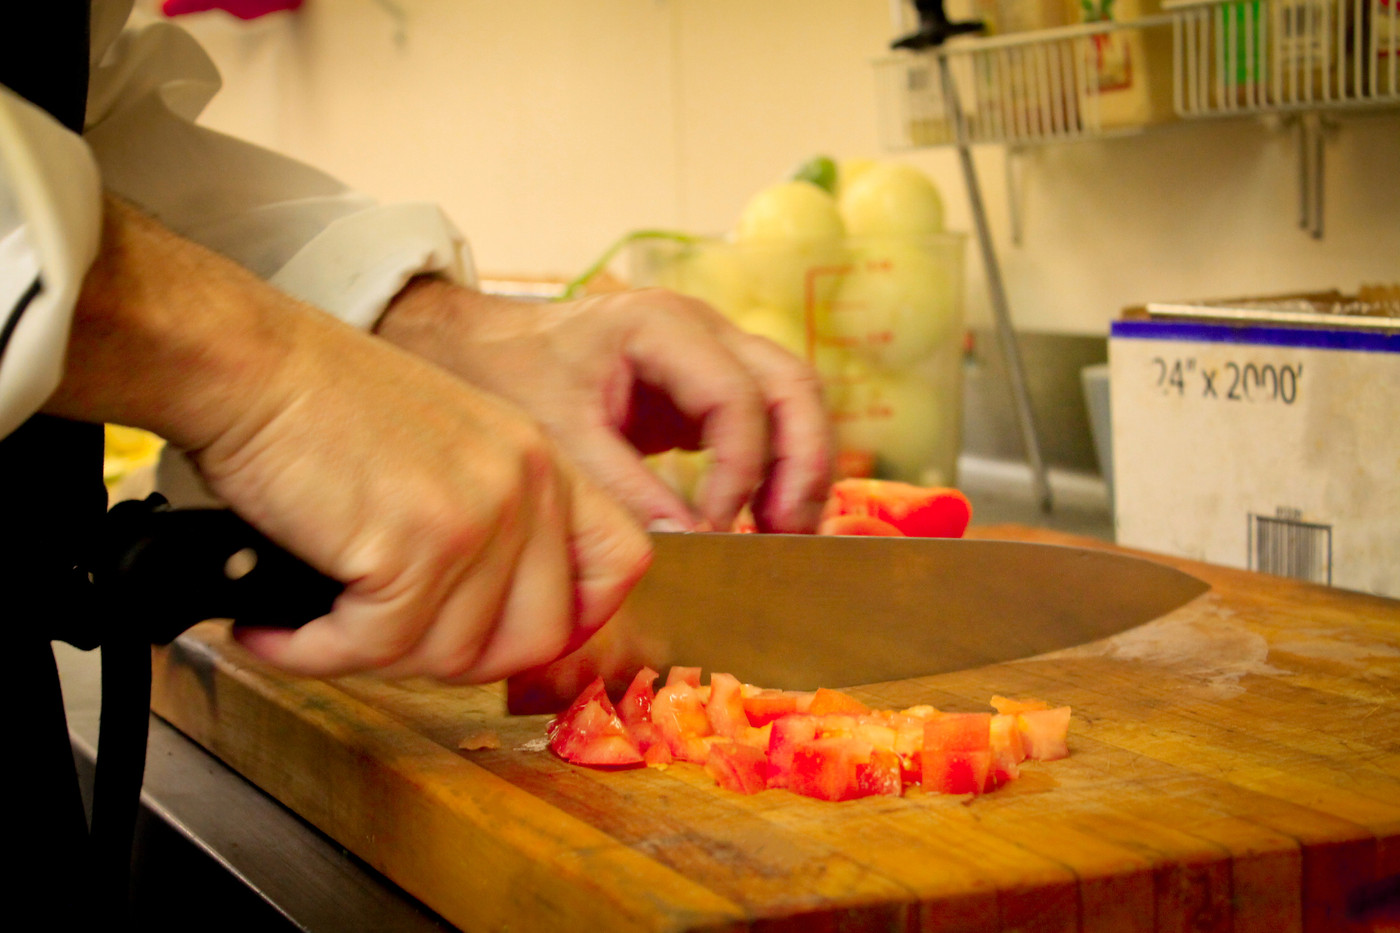 4 seasons chef cutting tomatoes.jpg